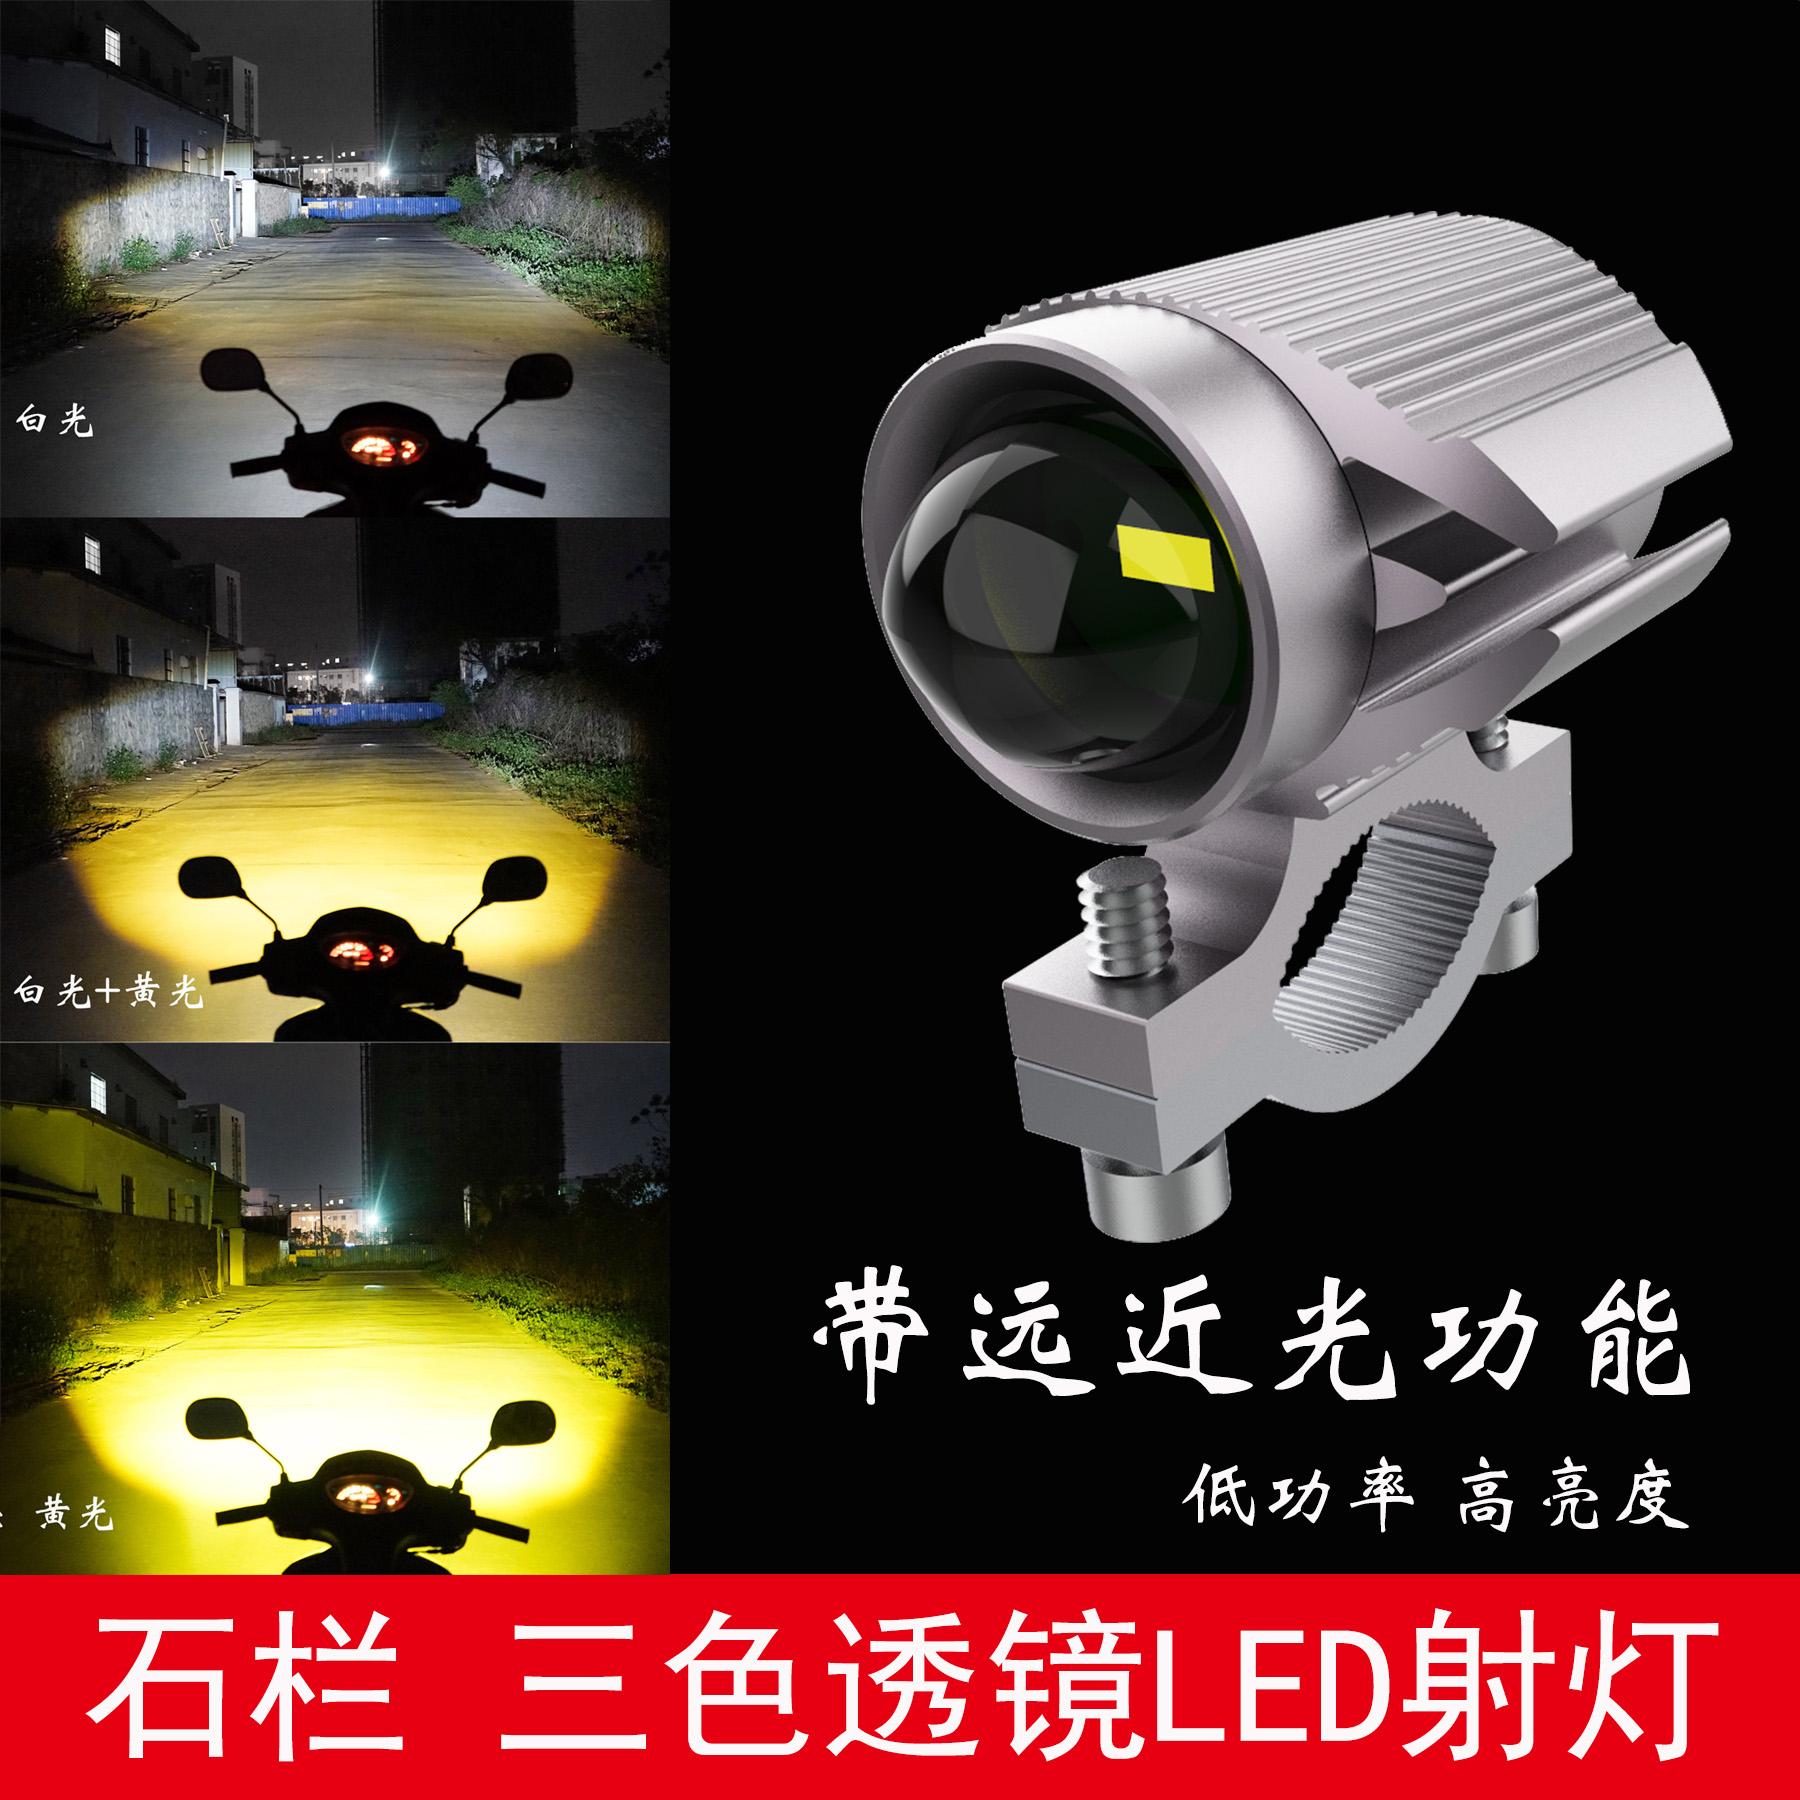 Shilan locomotive electric car LED living room light L29 lens spot light three-color yellow light auxiliary sharp eye car external